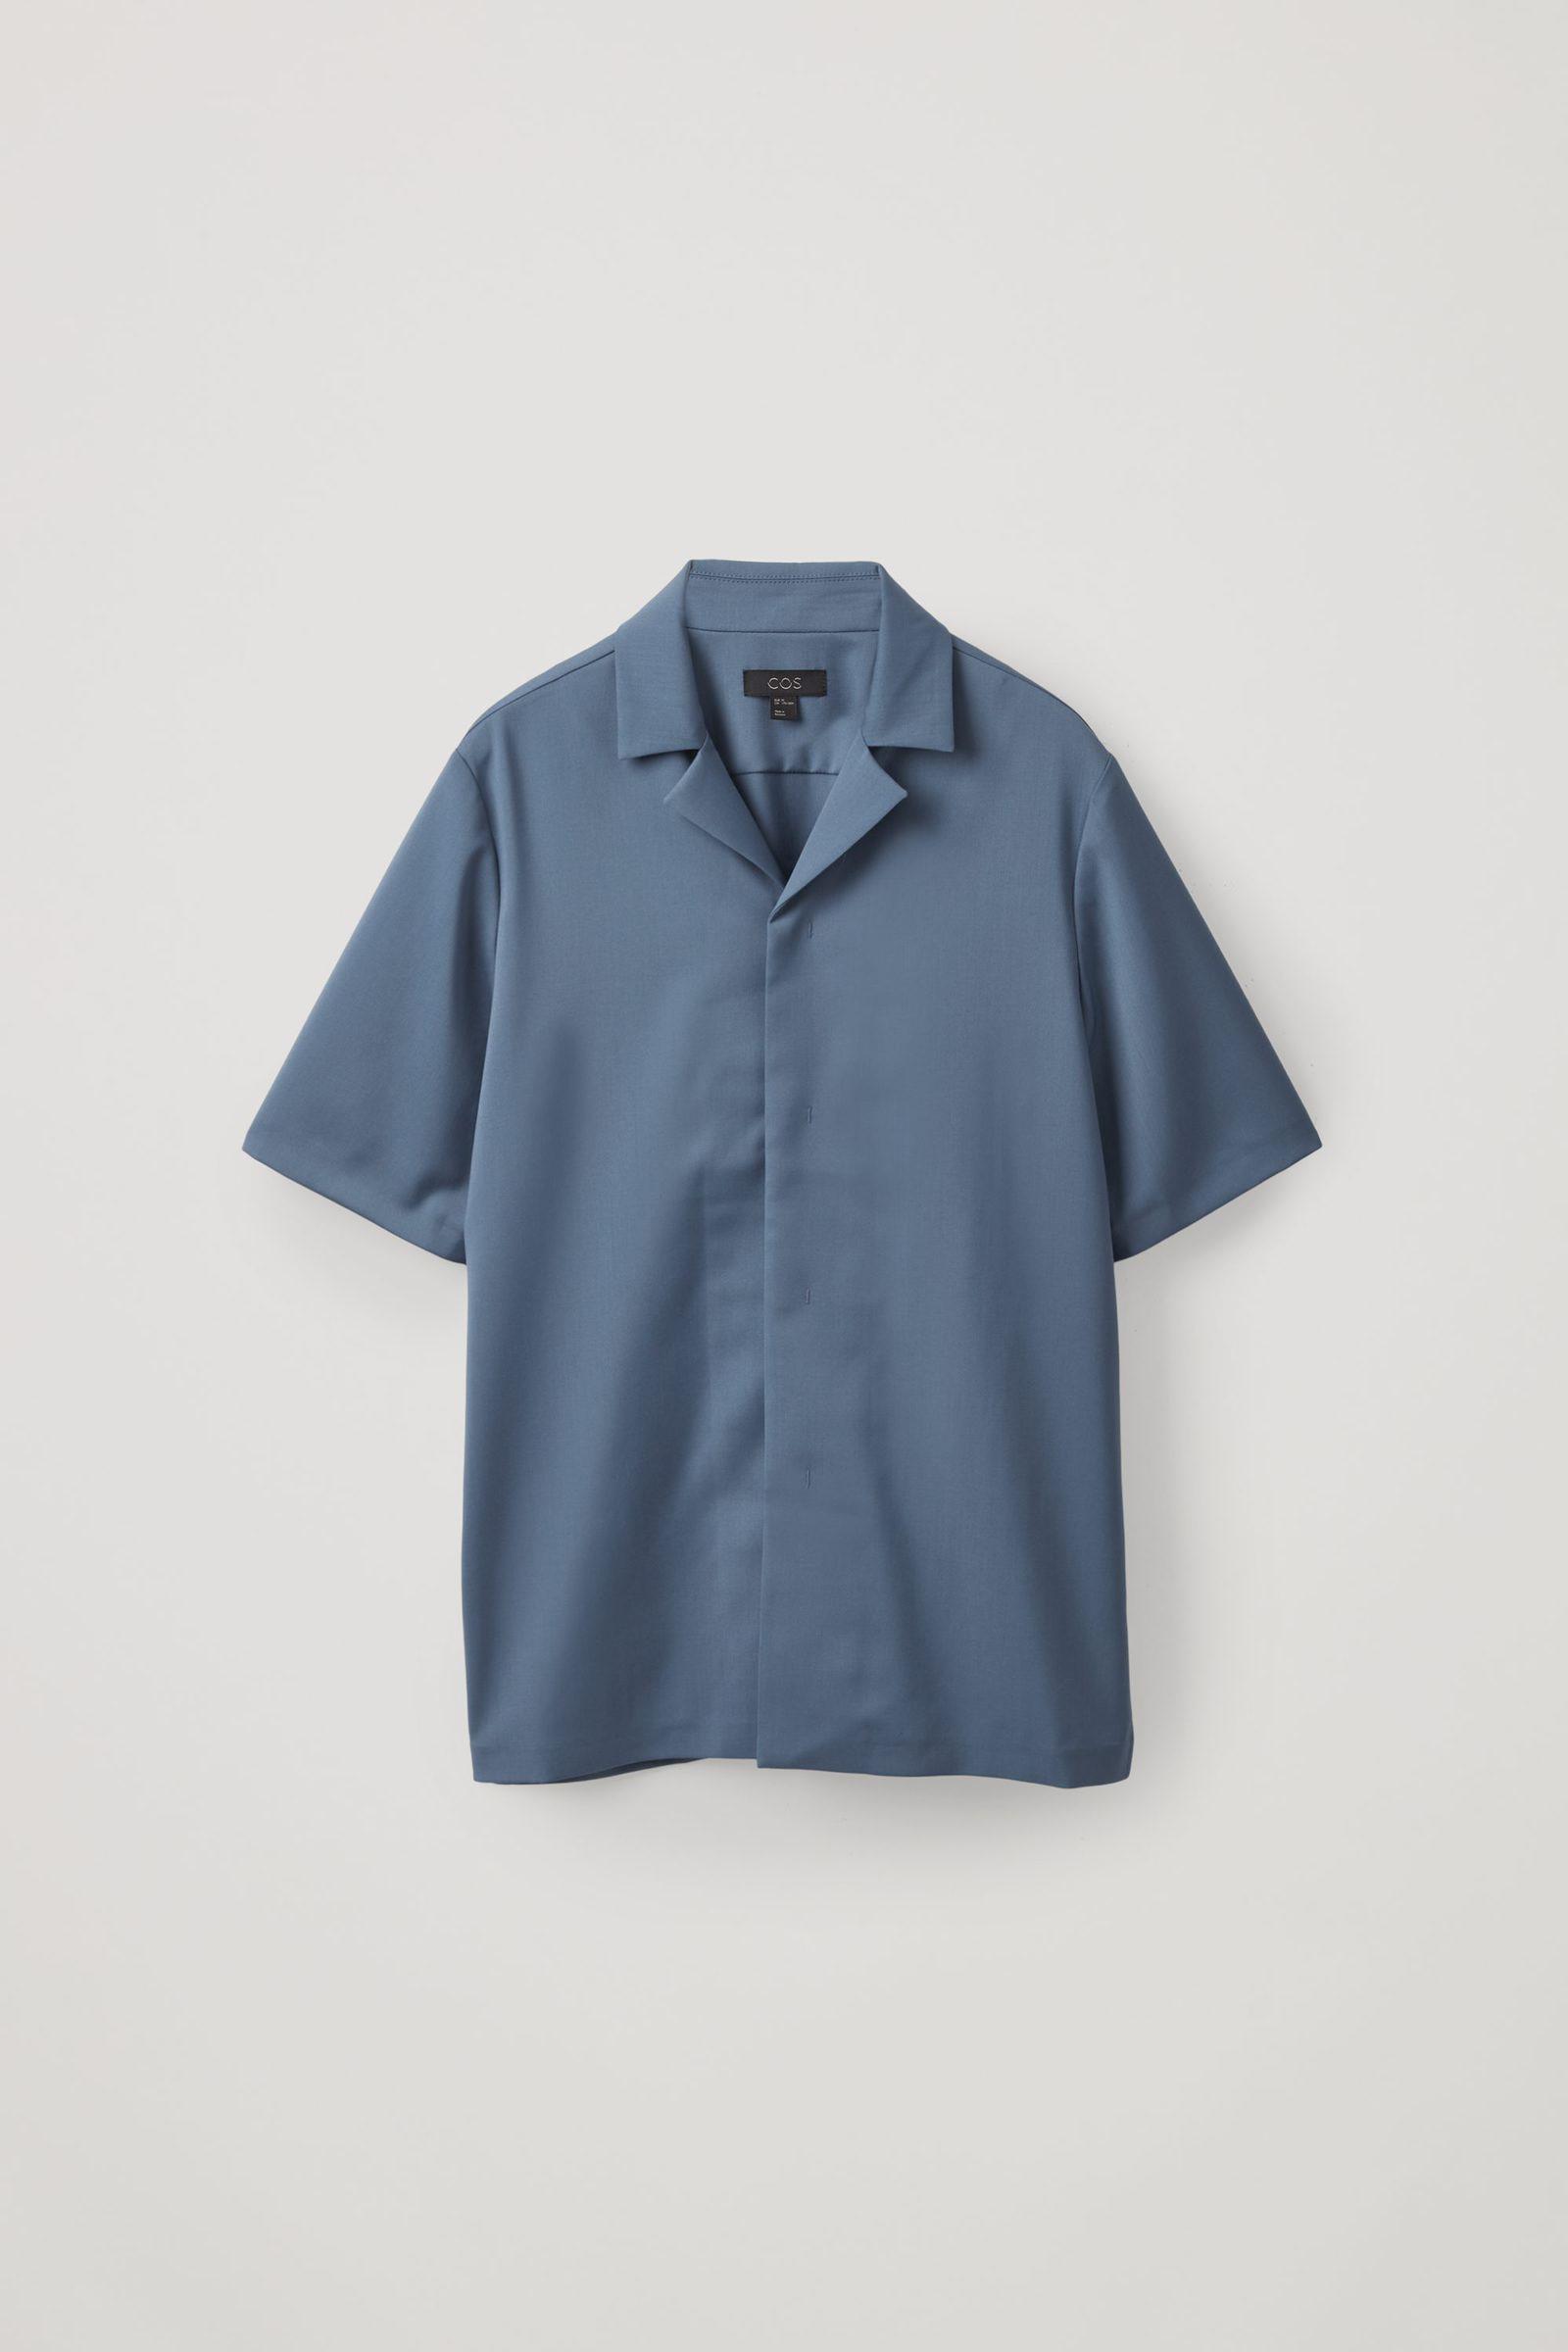 COS 캠프 칼라 울 셔츠의 스틸 블루컬러 Product입니다.